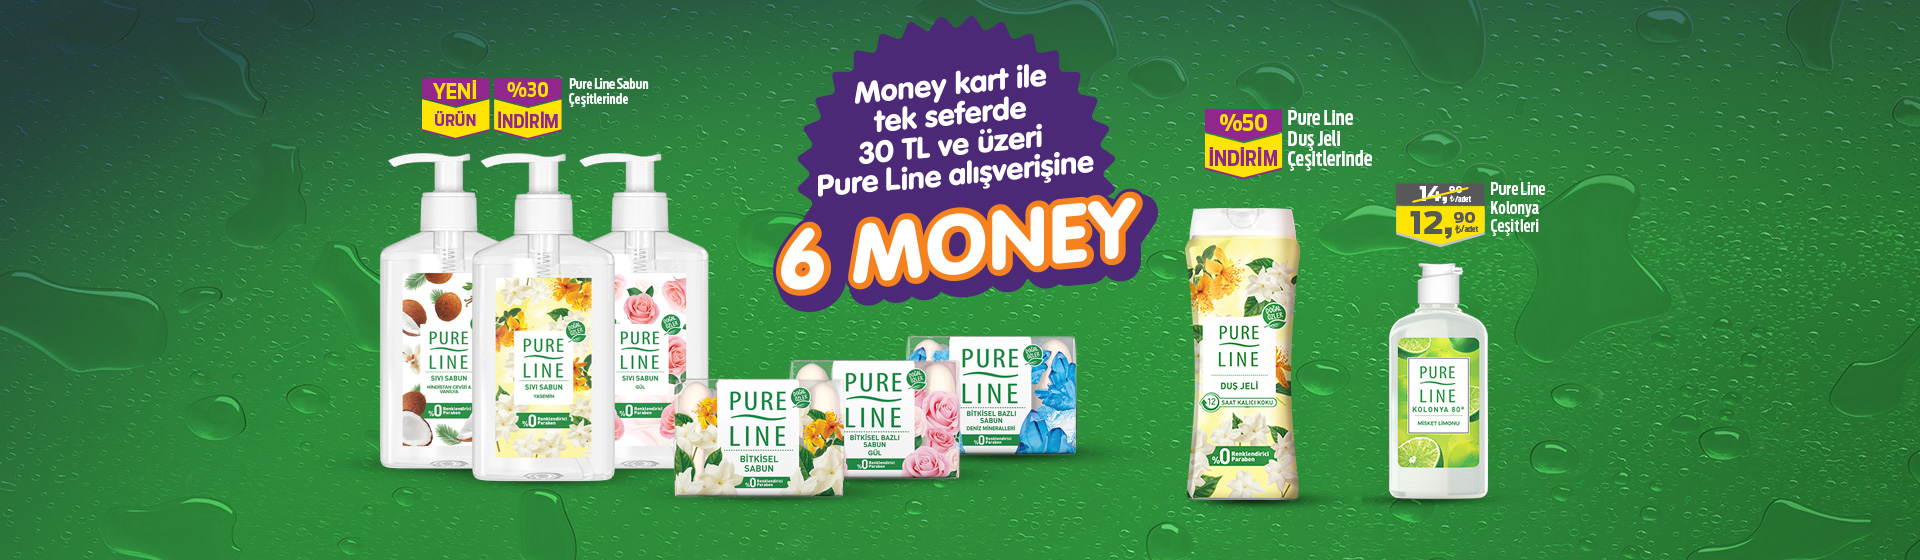 Pure Line Money Kampanyası